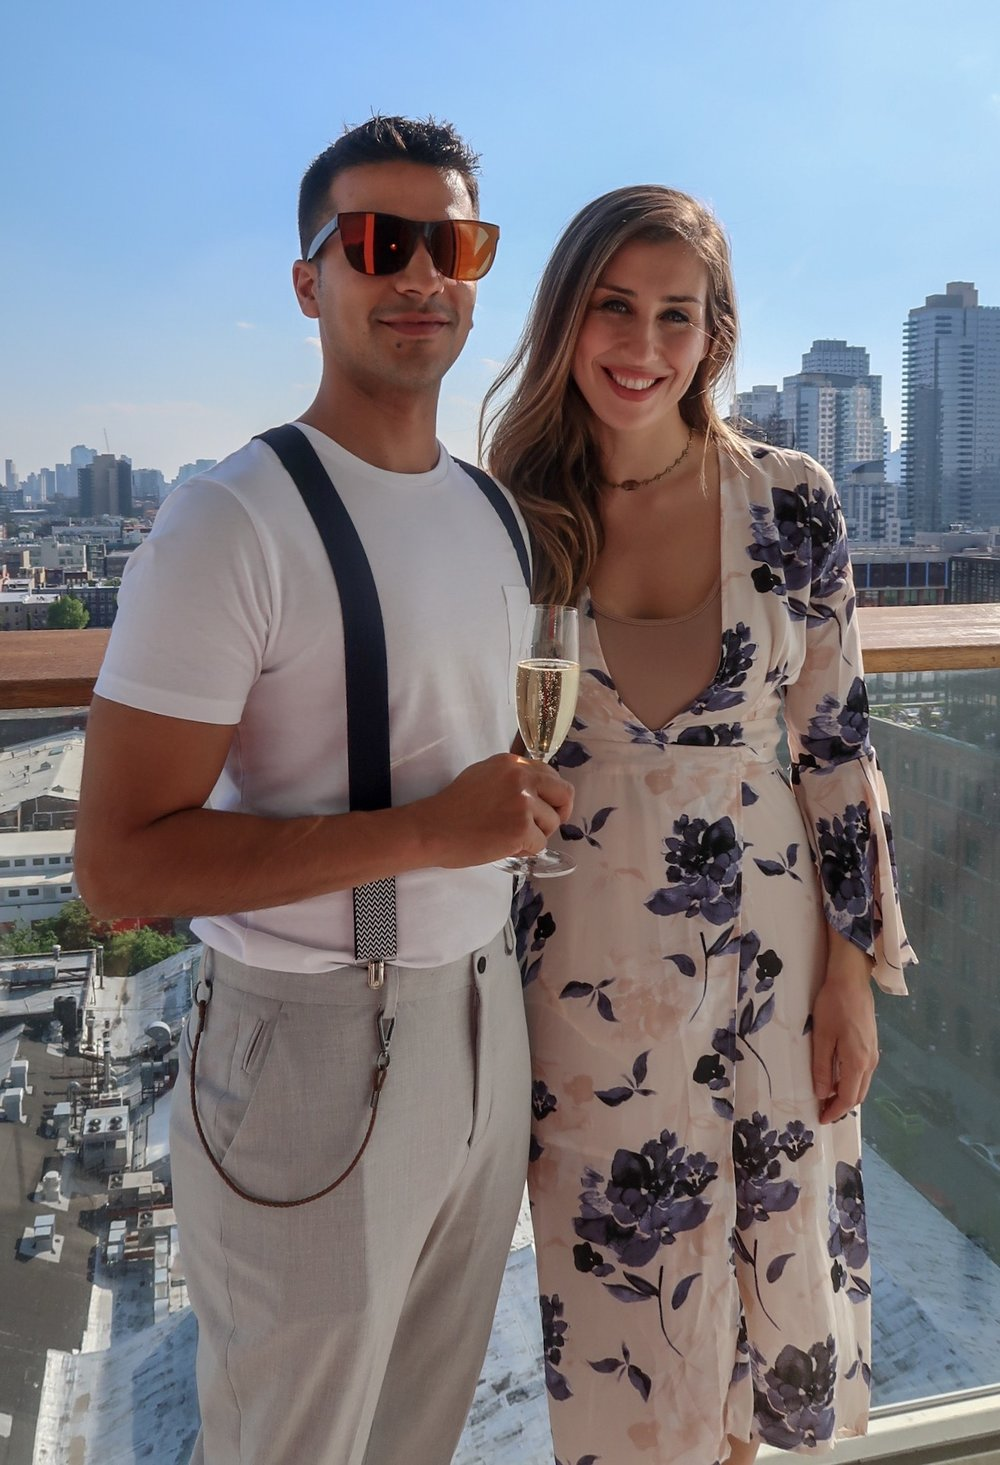 My boyfriend & I in New York recently!